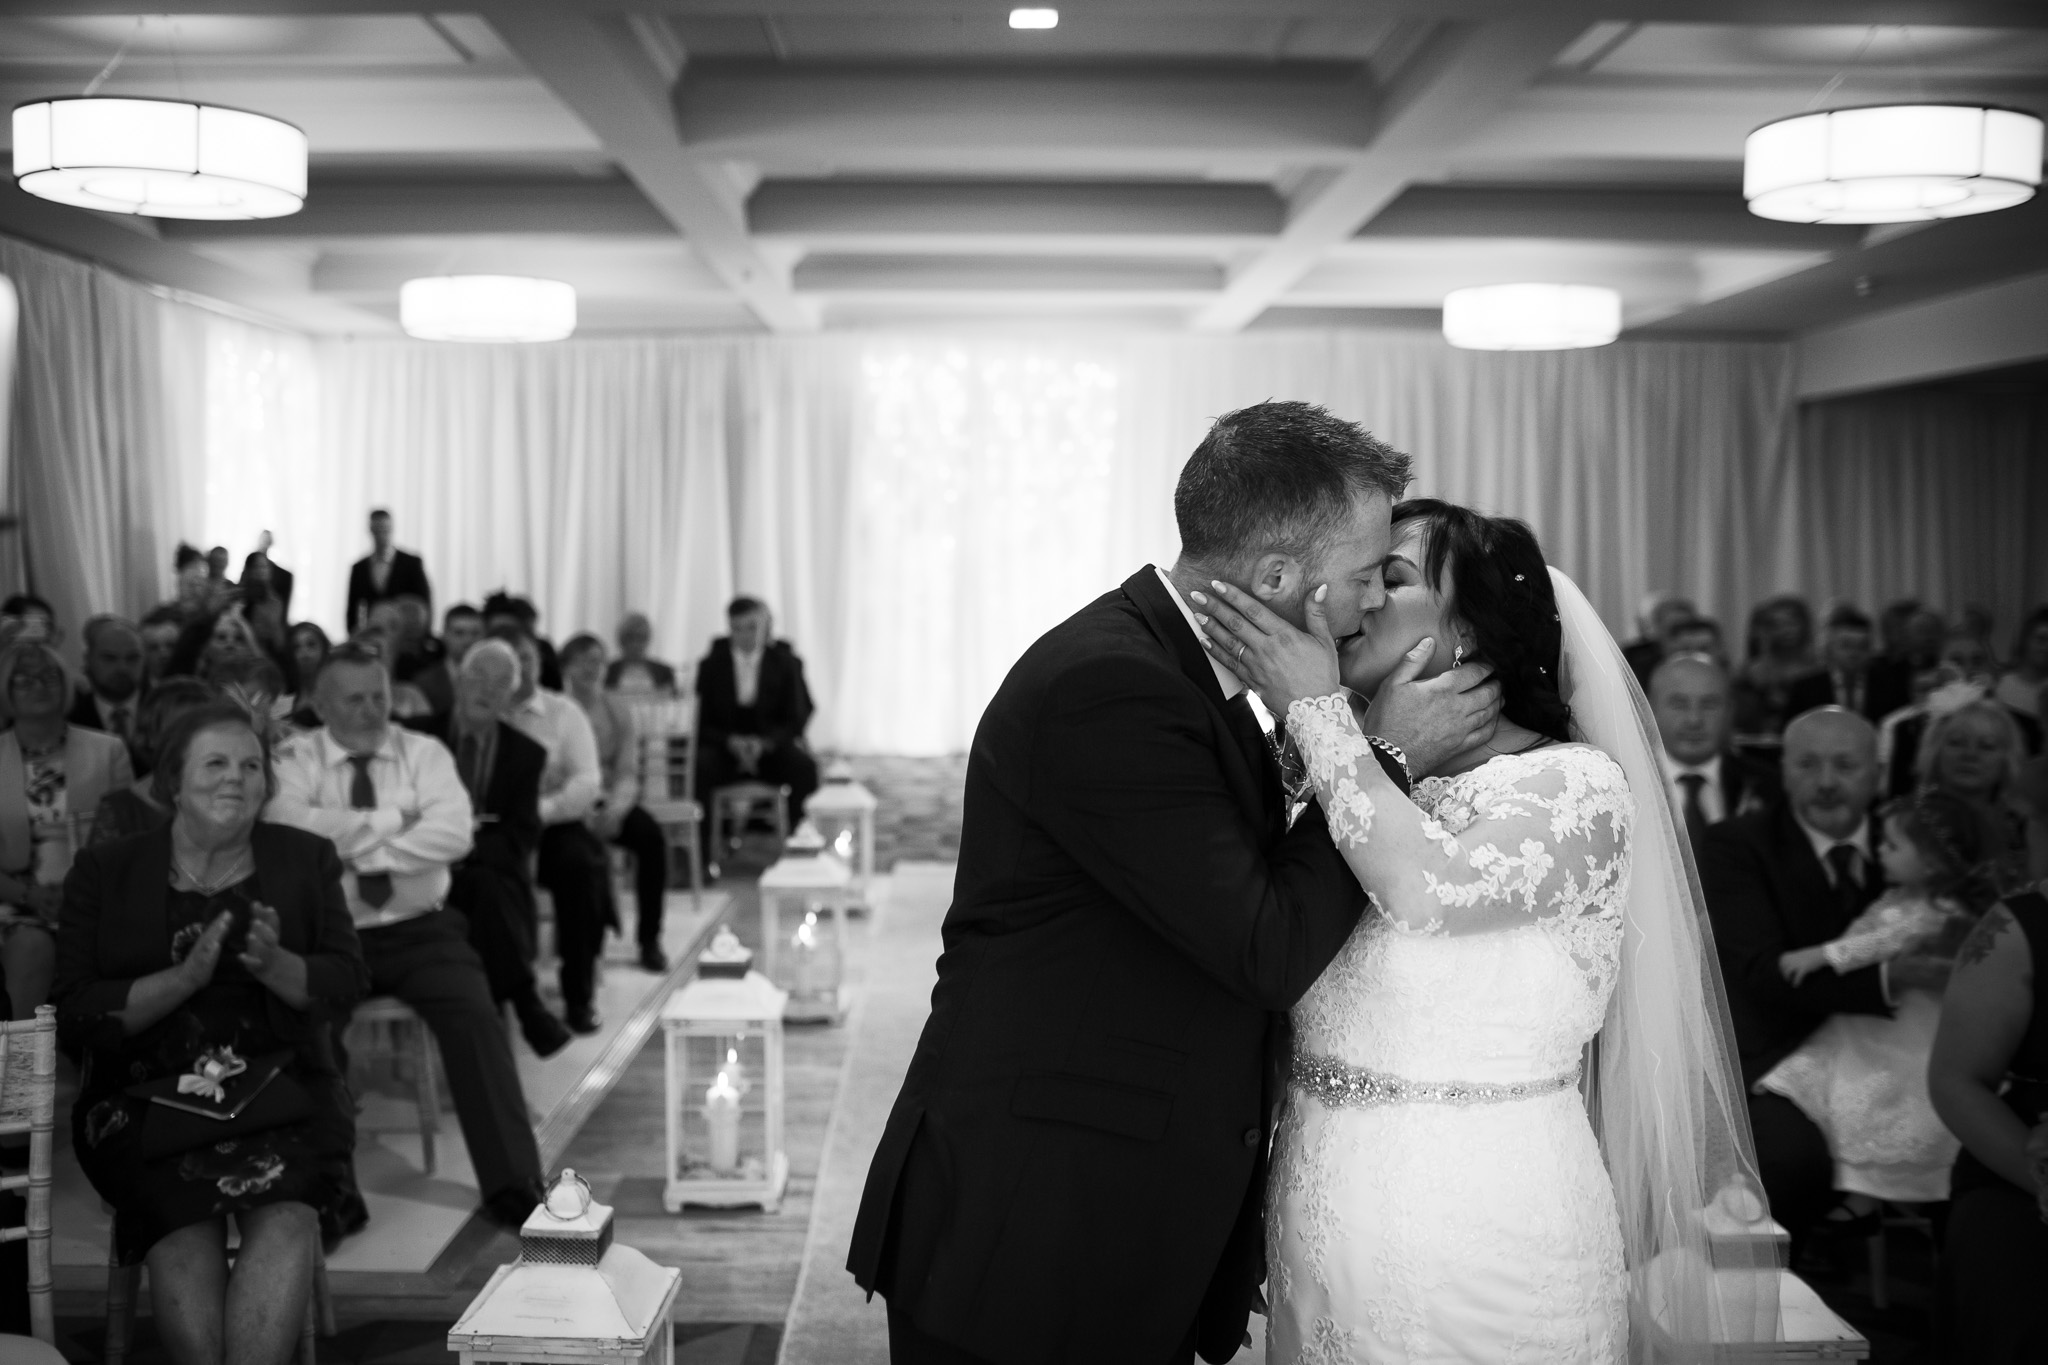 Mark_Barnes_Northern_Ireland_Wedding_Photography_Marine_hotel_ballycastle_Wedding_Photography_Janet&Darren-15.jpg